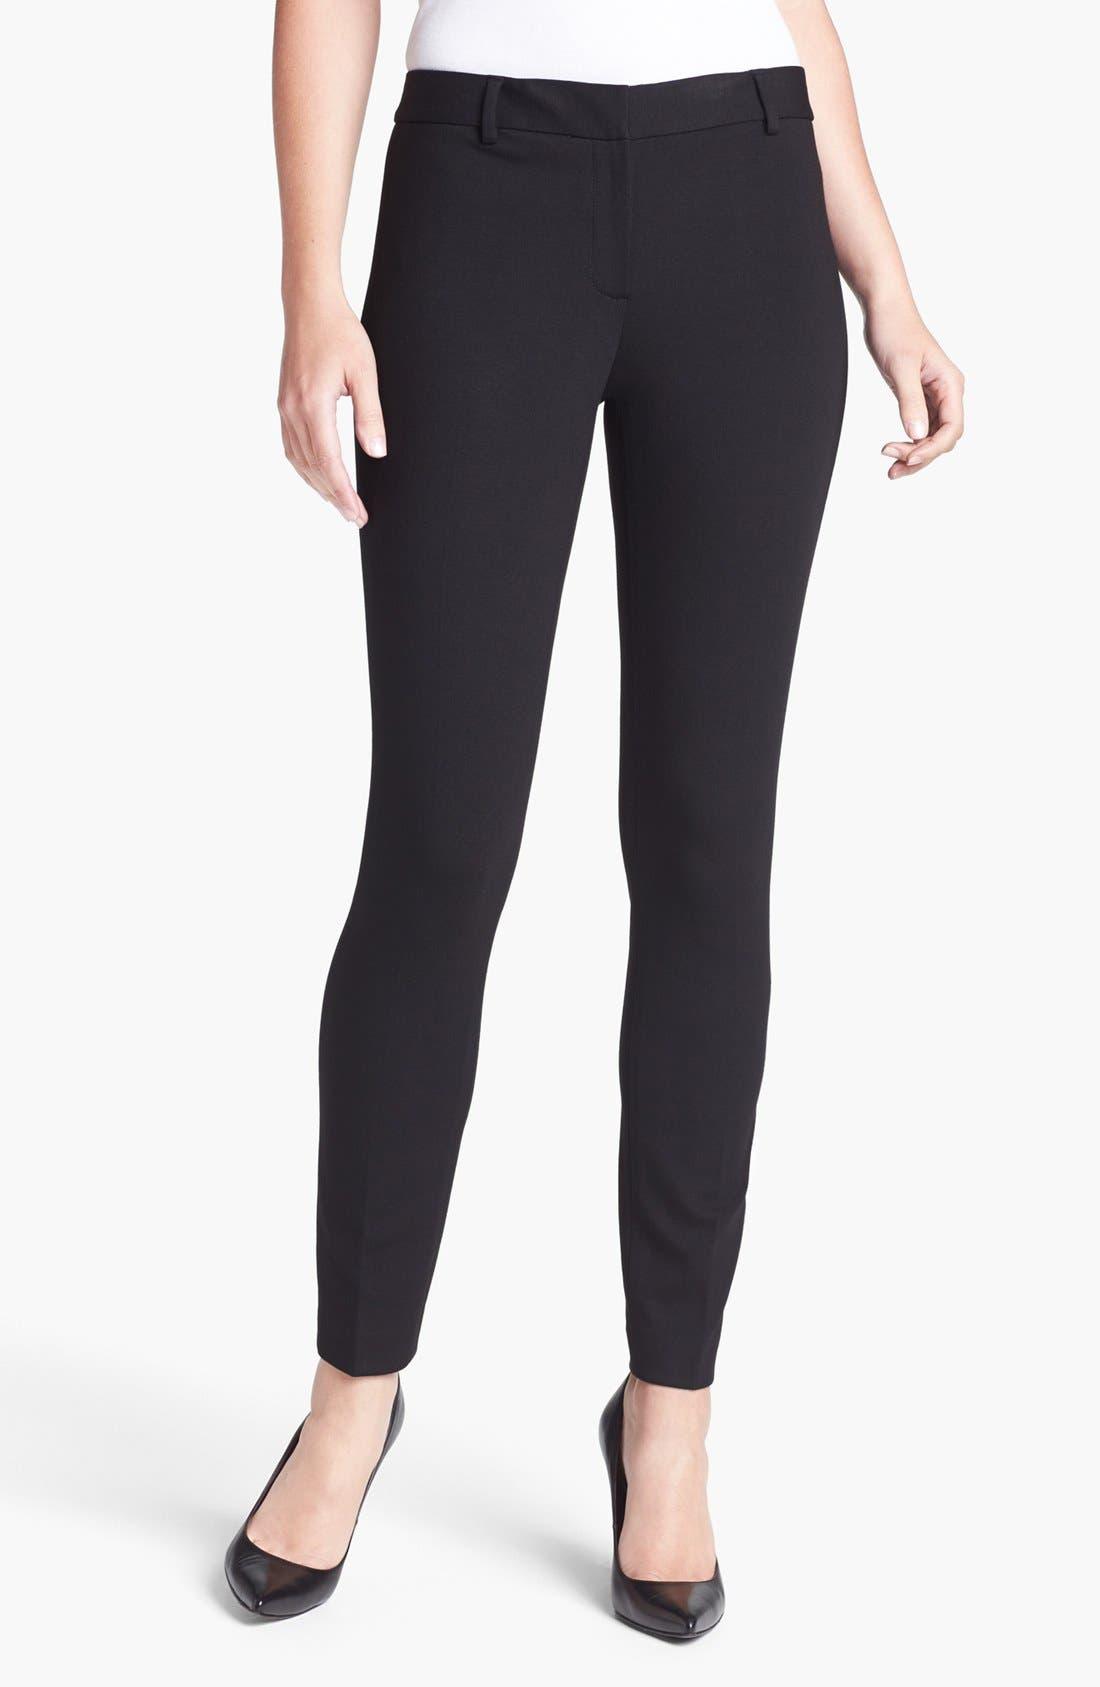 Main Image - Elie Tahari 'Verda' Slim Pants